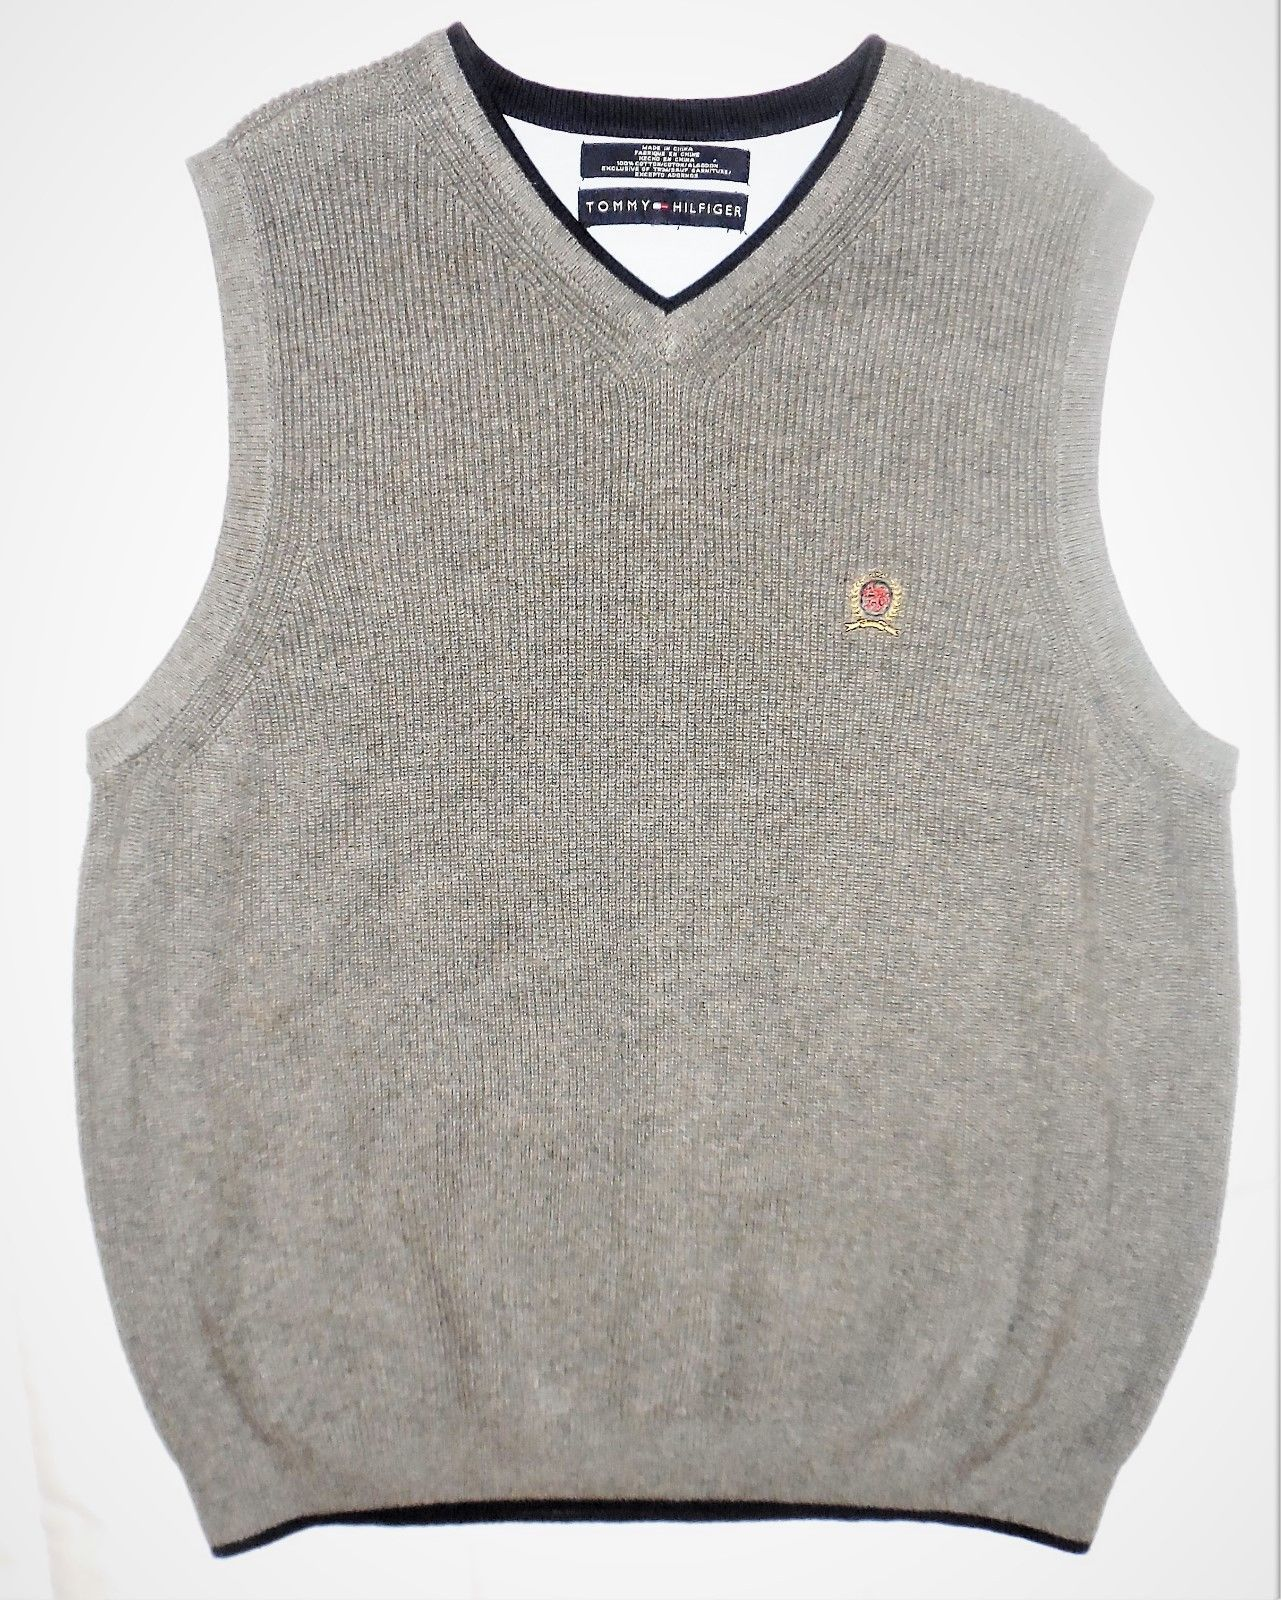 Tommy Hilfiger M Gray Knit V-Neck 100% Cotton Pullover Sleeveless Sweater Vest image 6